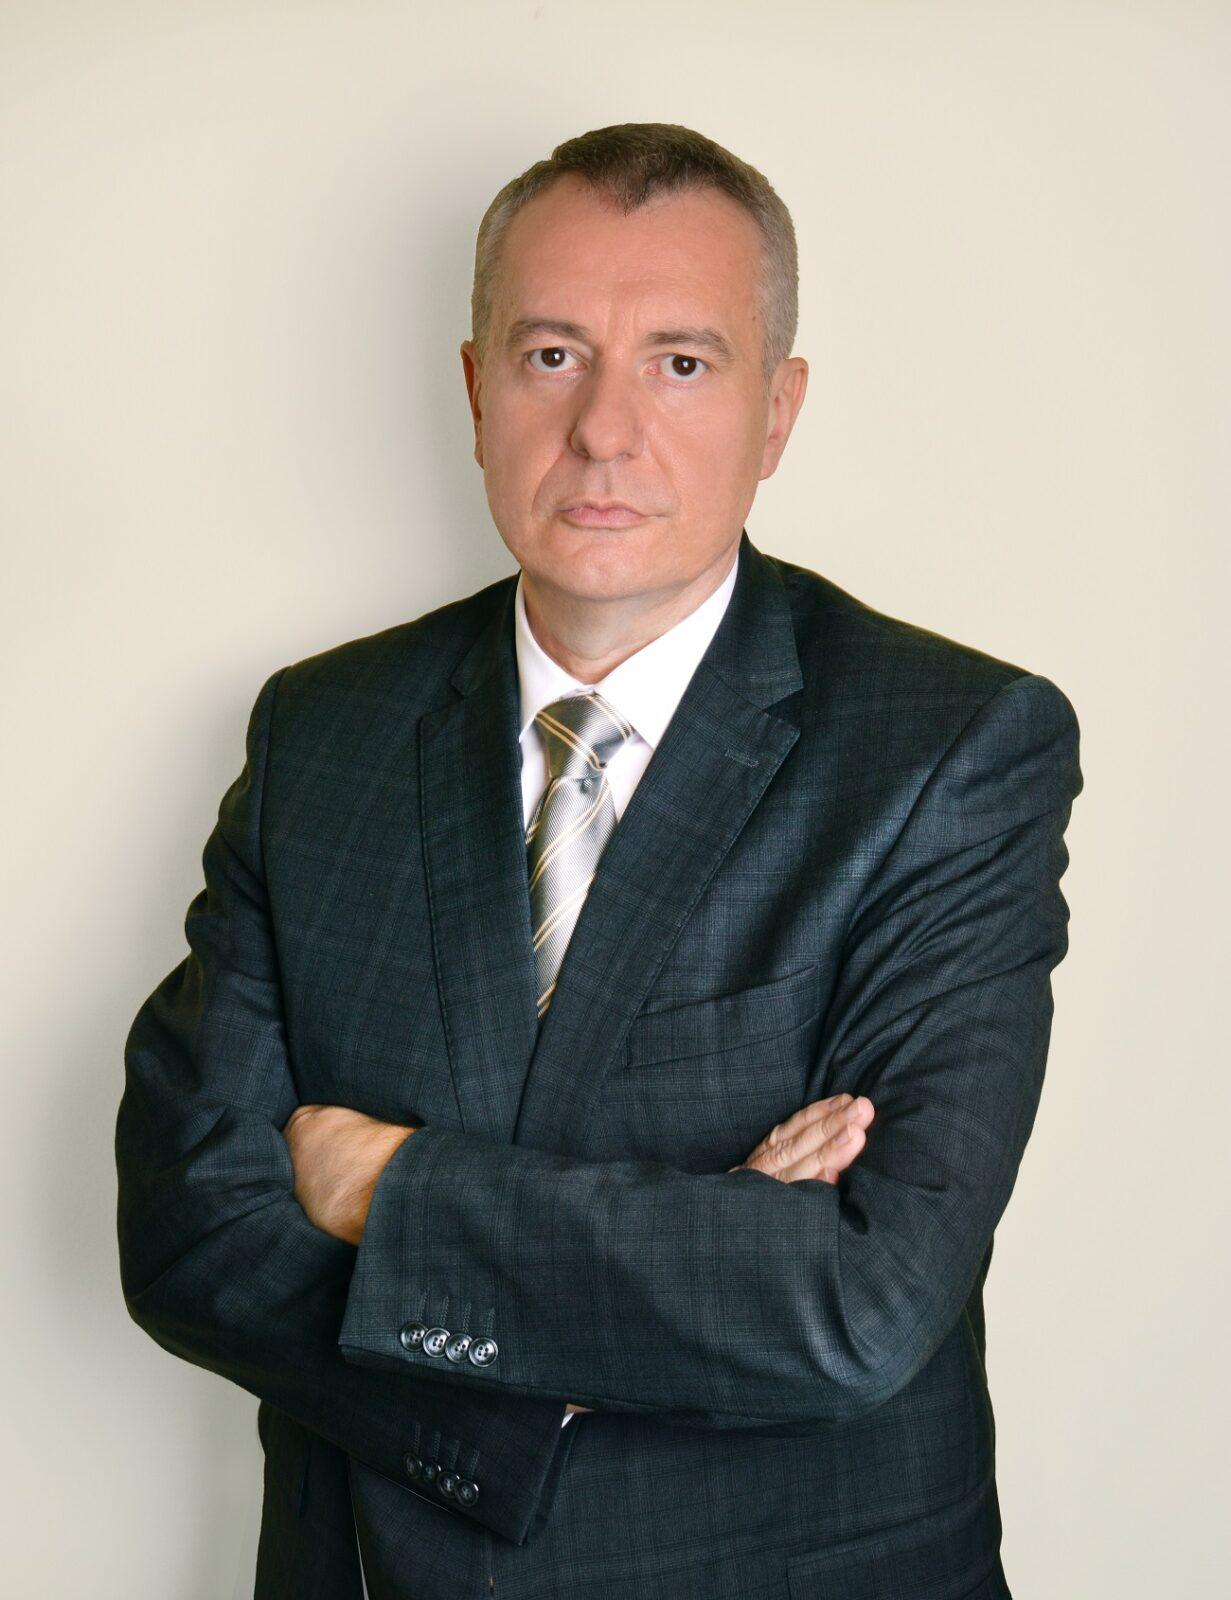 Nikola Cvijanovic univerexport